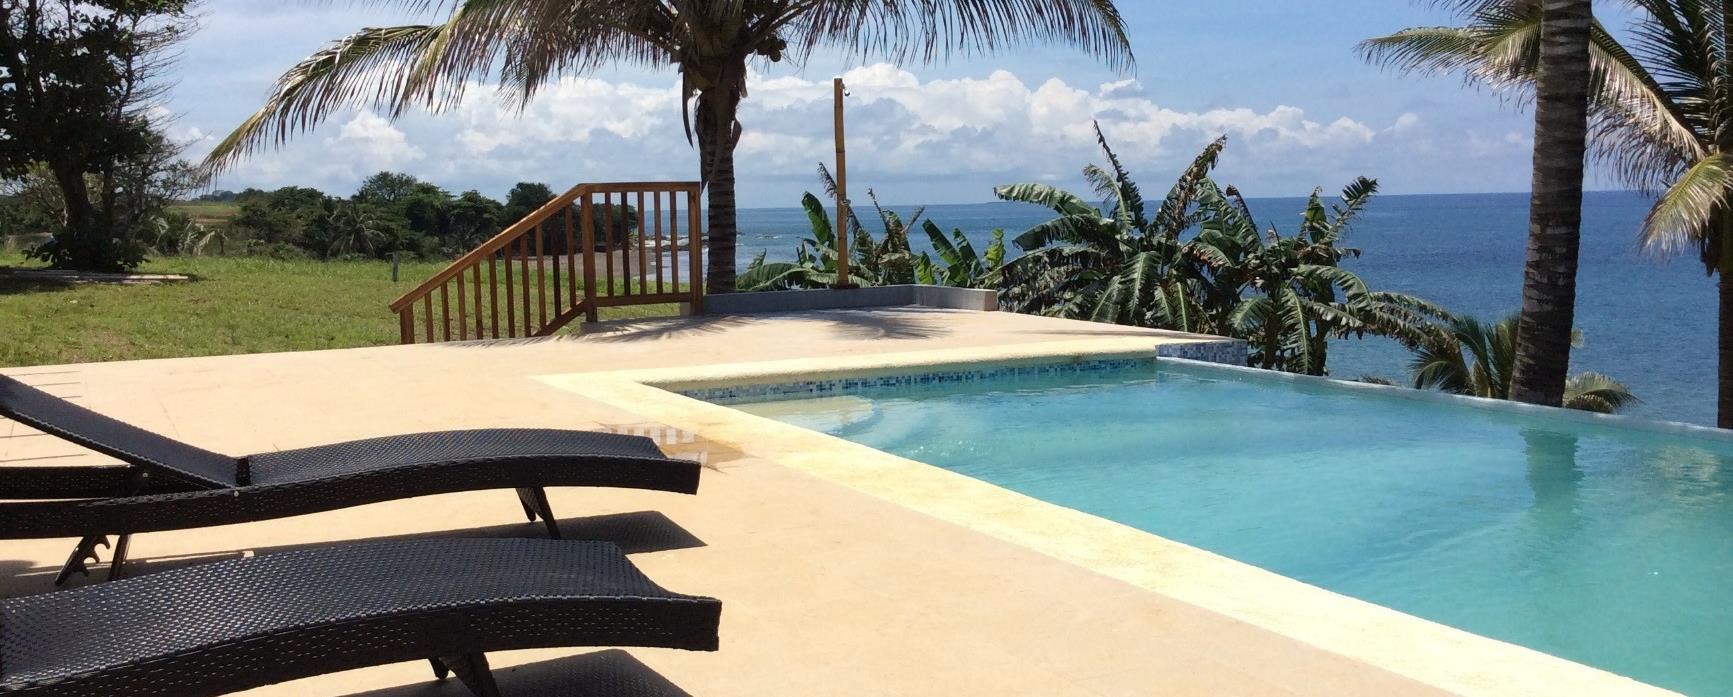 Oceanfront_lots_for_sale_Panama-1.jpg